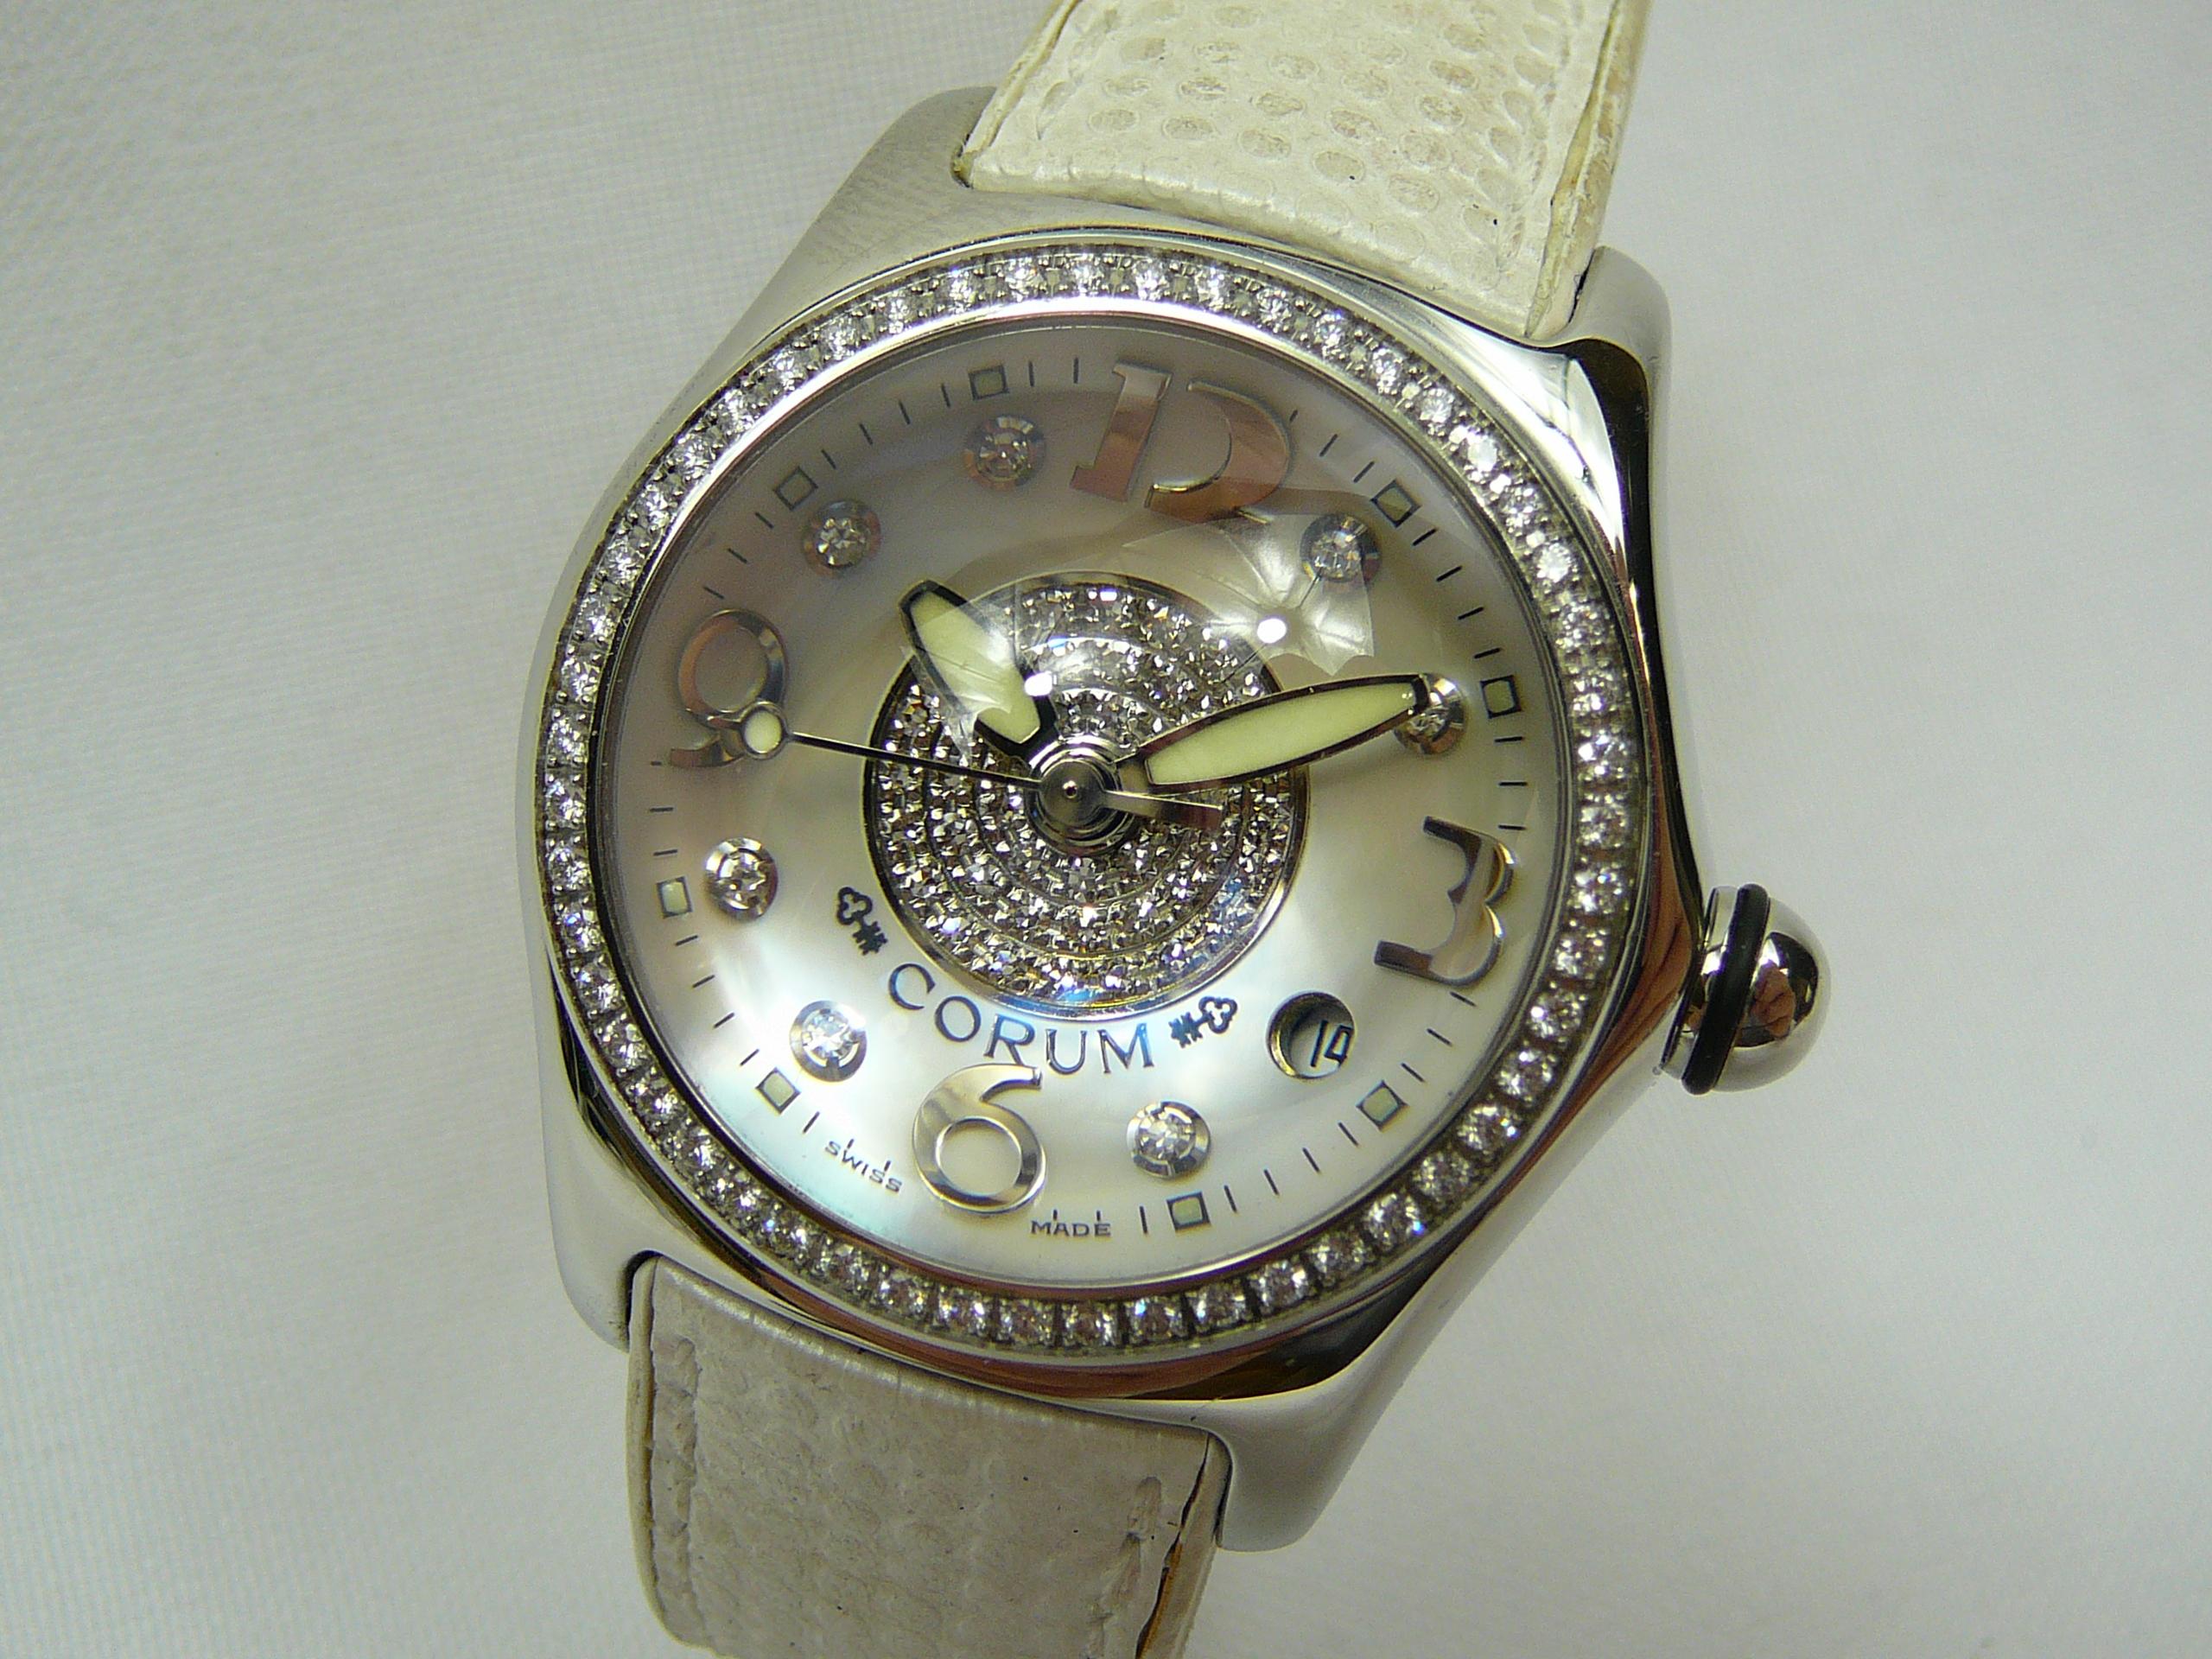 Ladies Corum Wrist Watch - Image 2 of 3